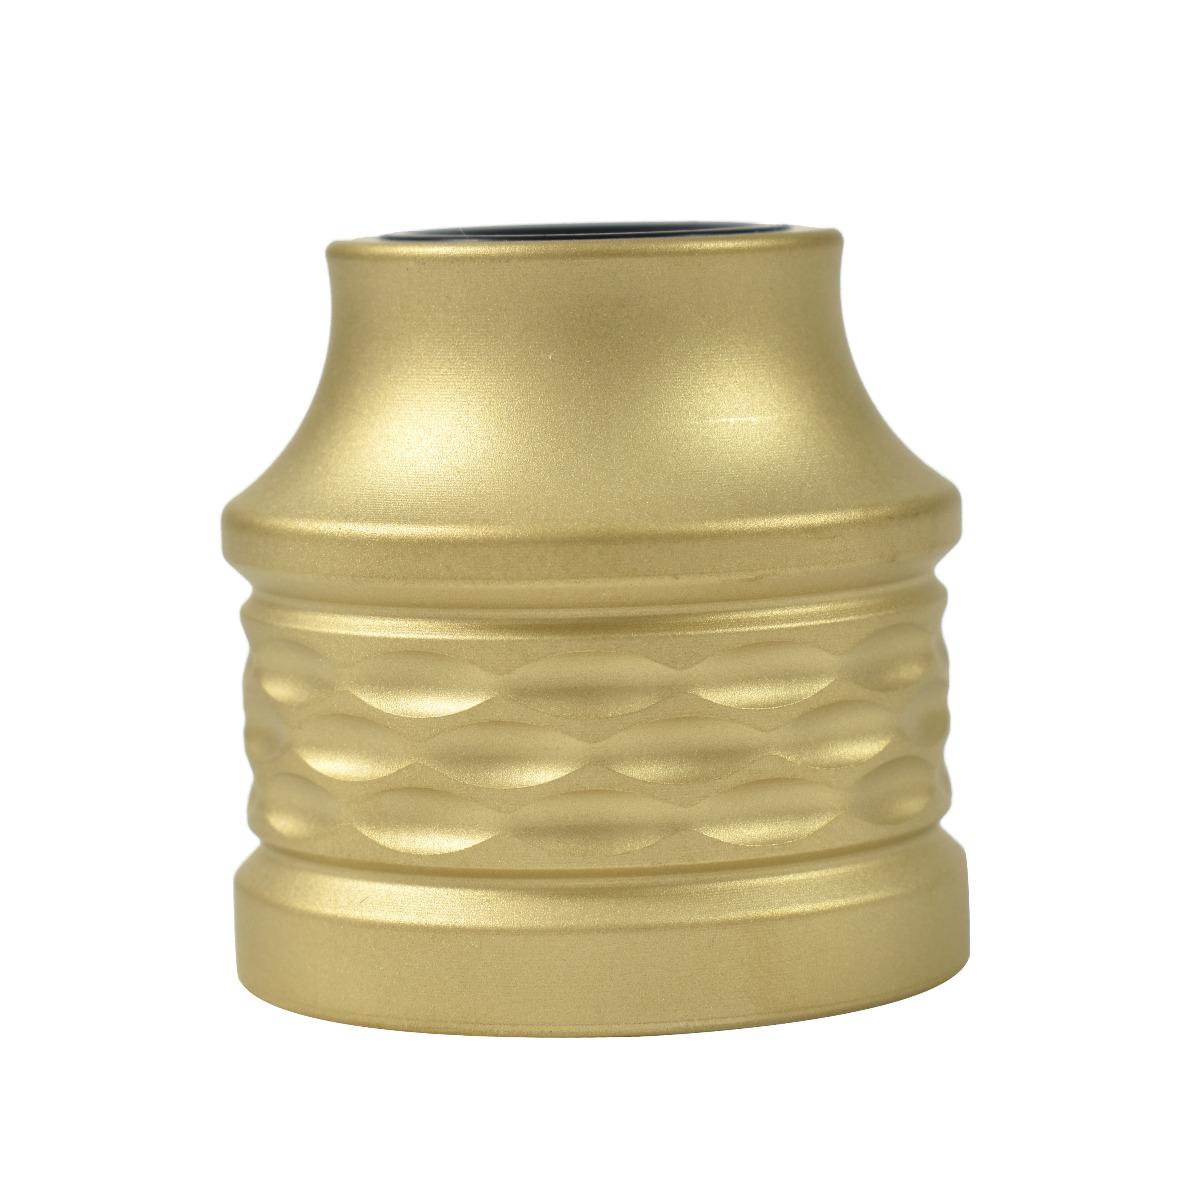 Karve Solid Brass Inkwell Razor Stand